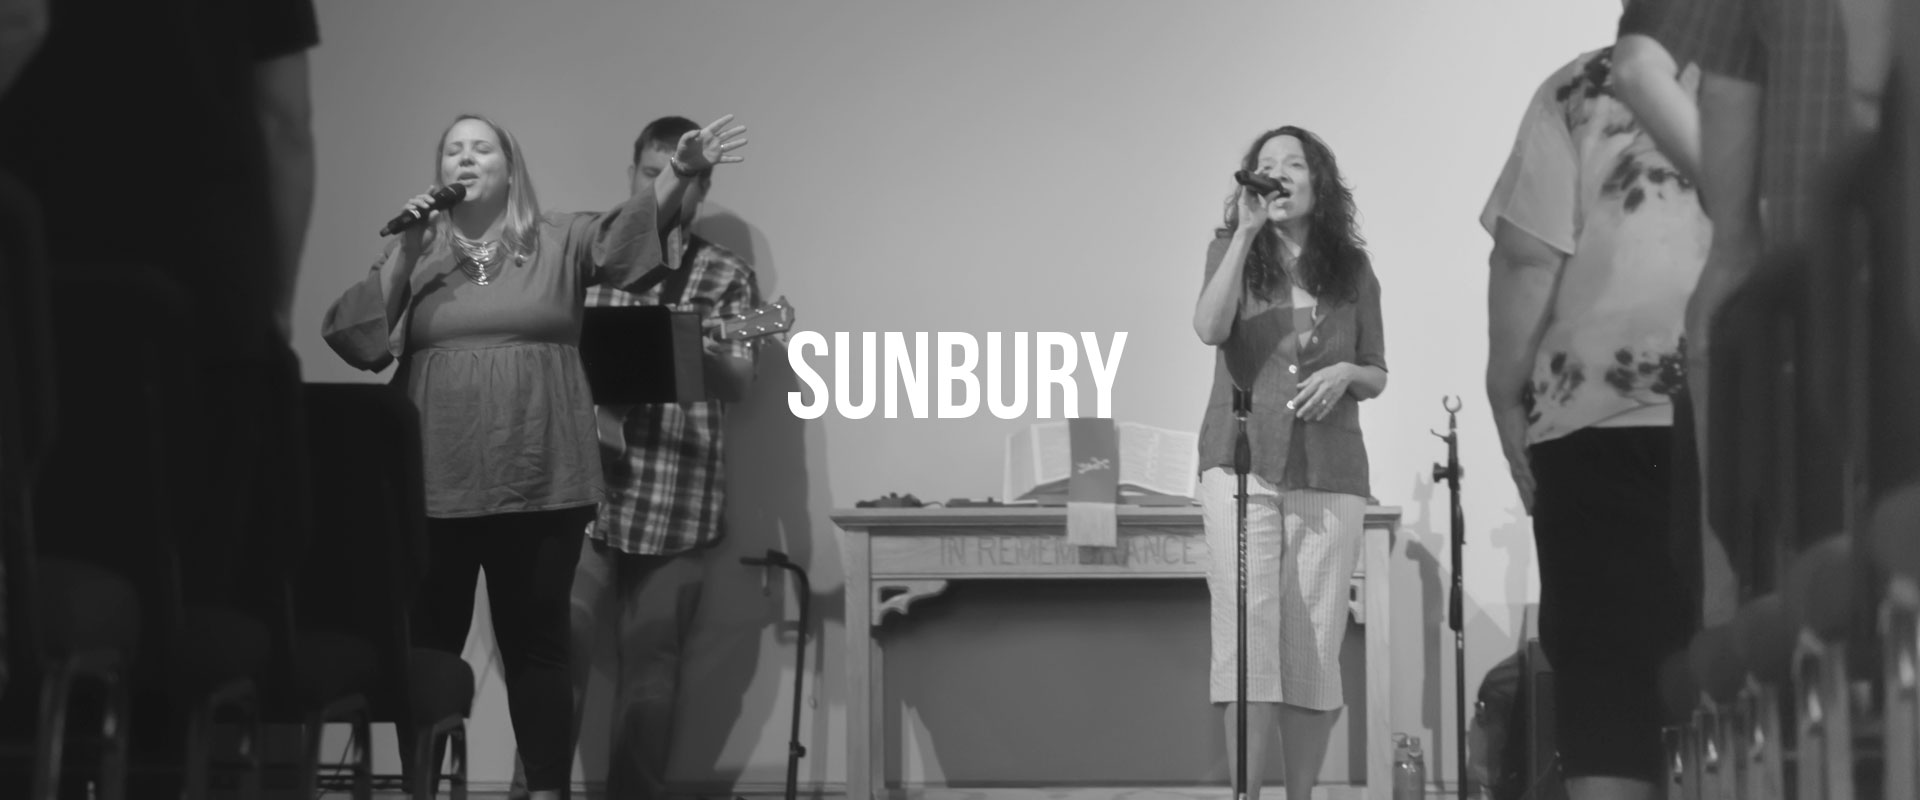 sunbury-header-2